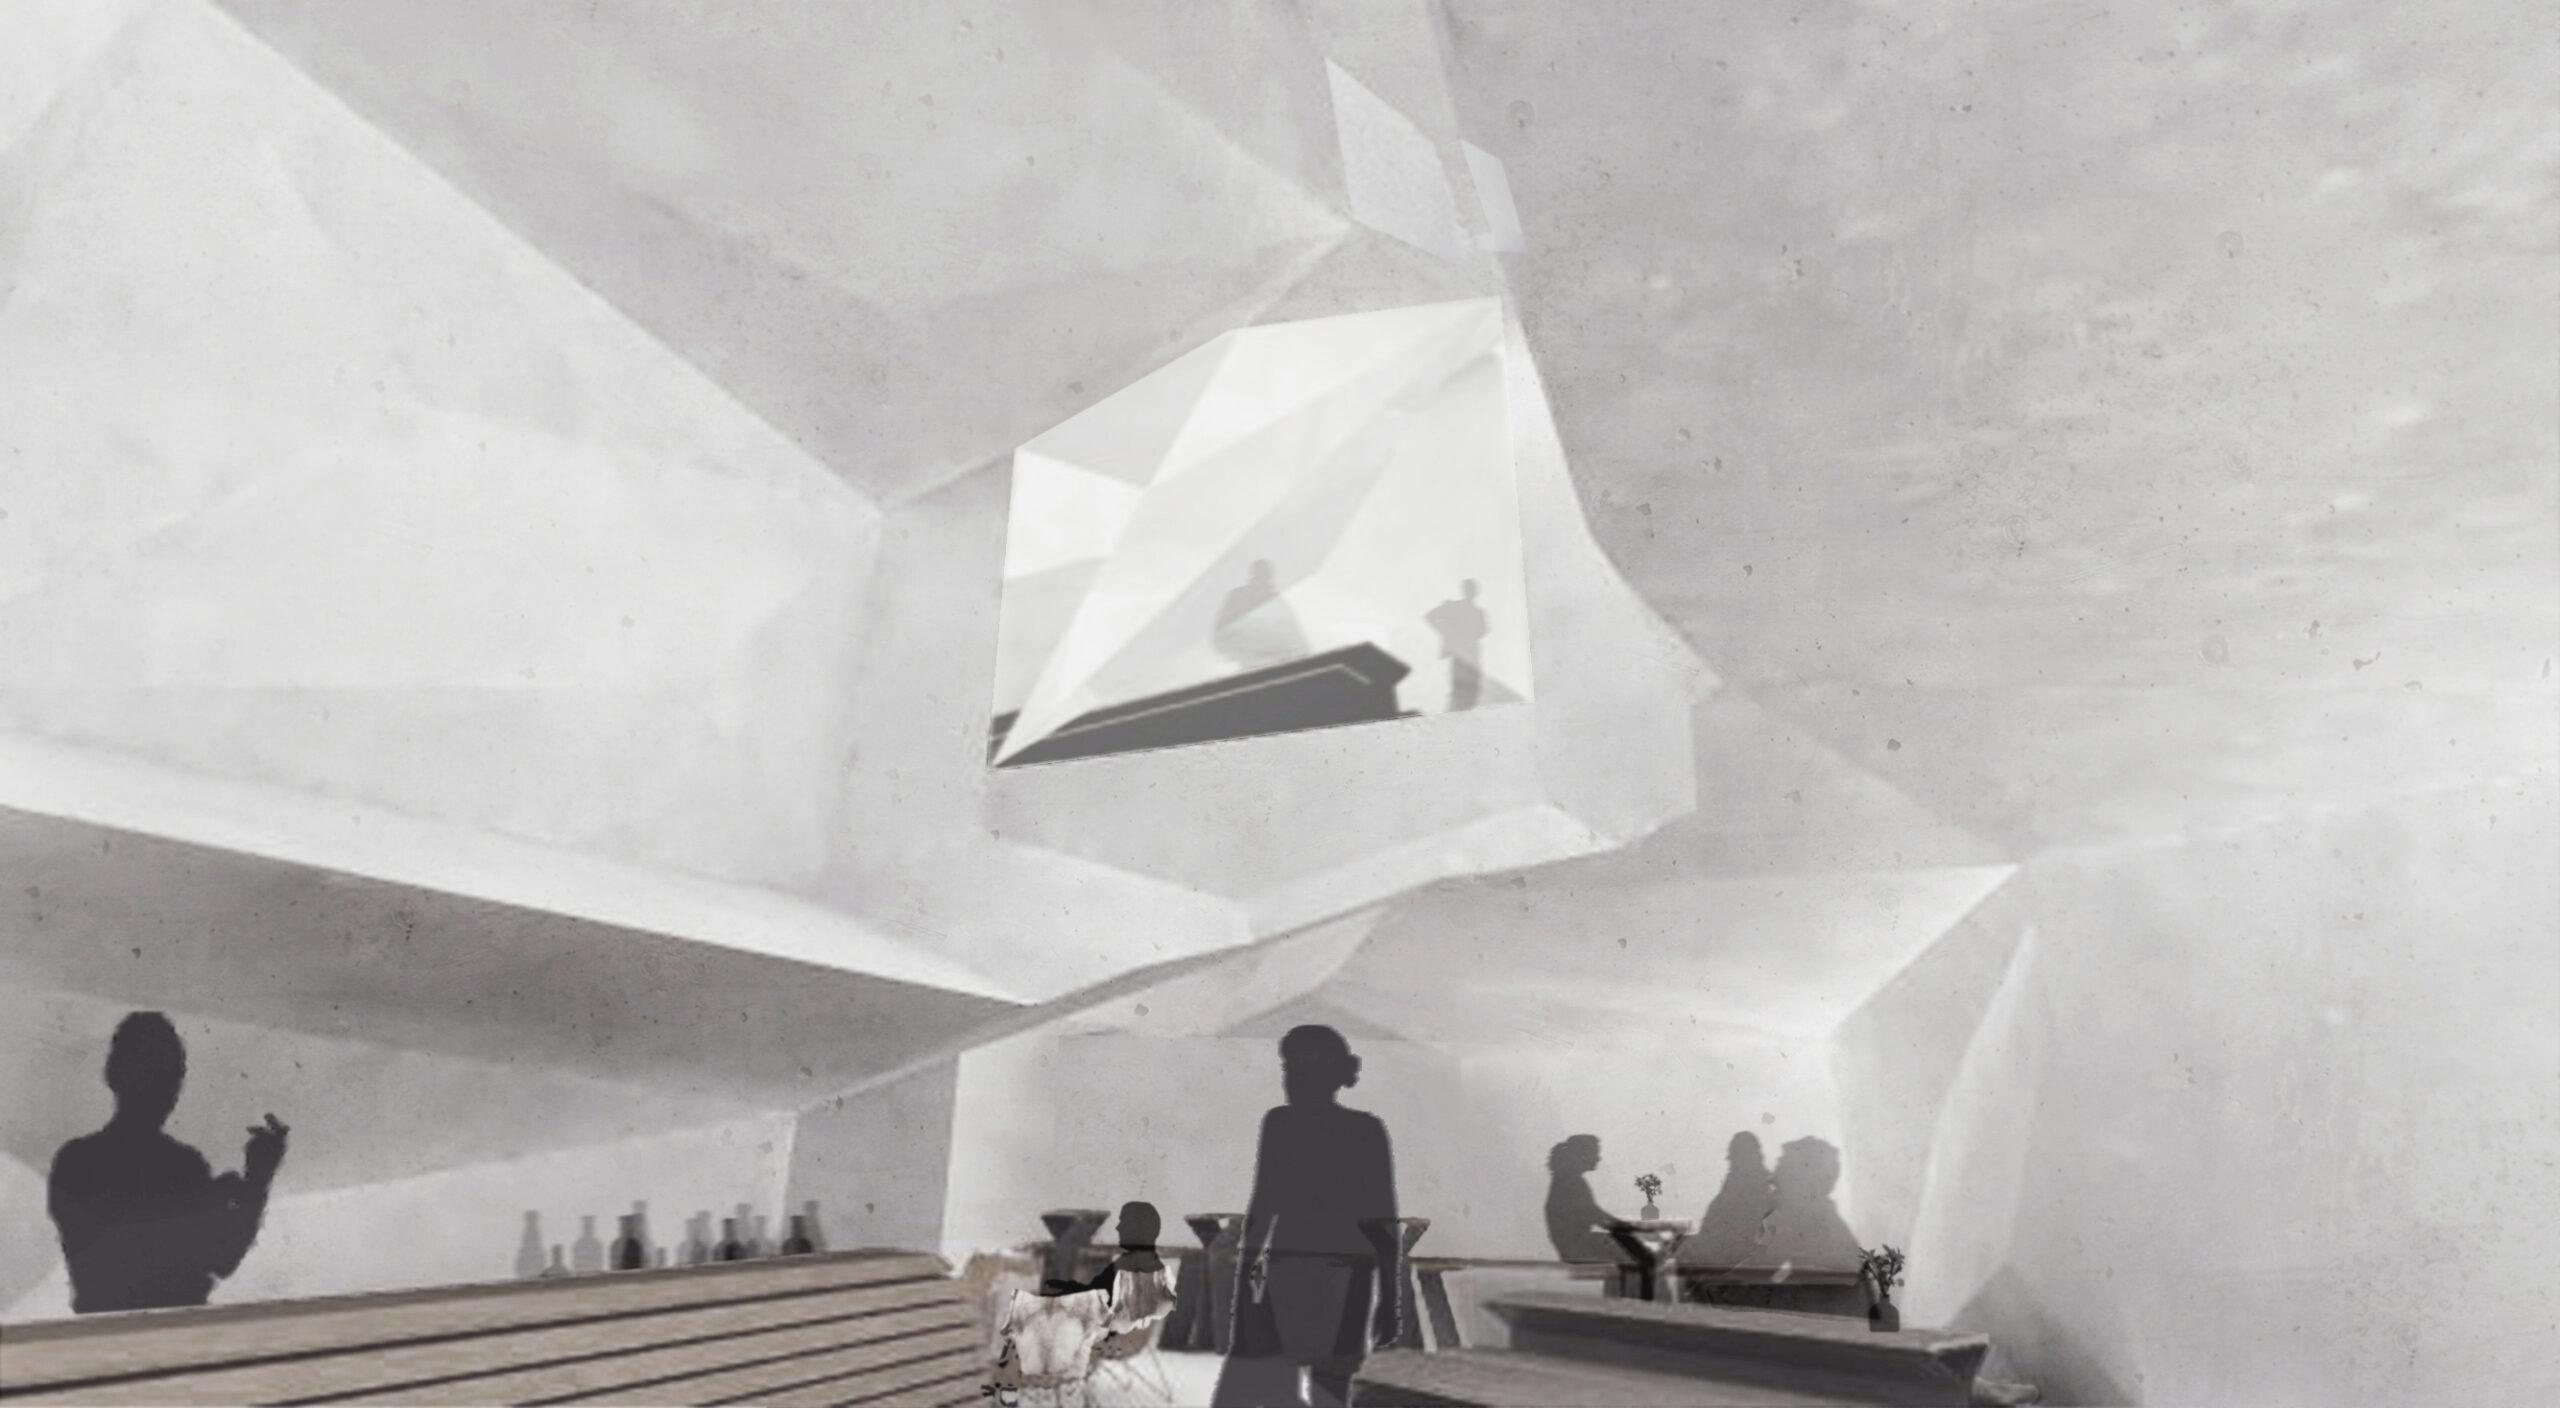 Michael-Becker-Architects-Architekten-Gipfelstation-Nebelhorn-Perspektive-K09